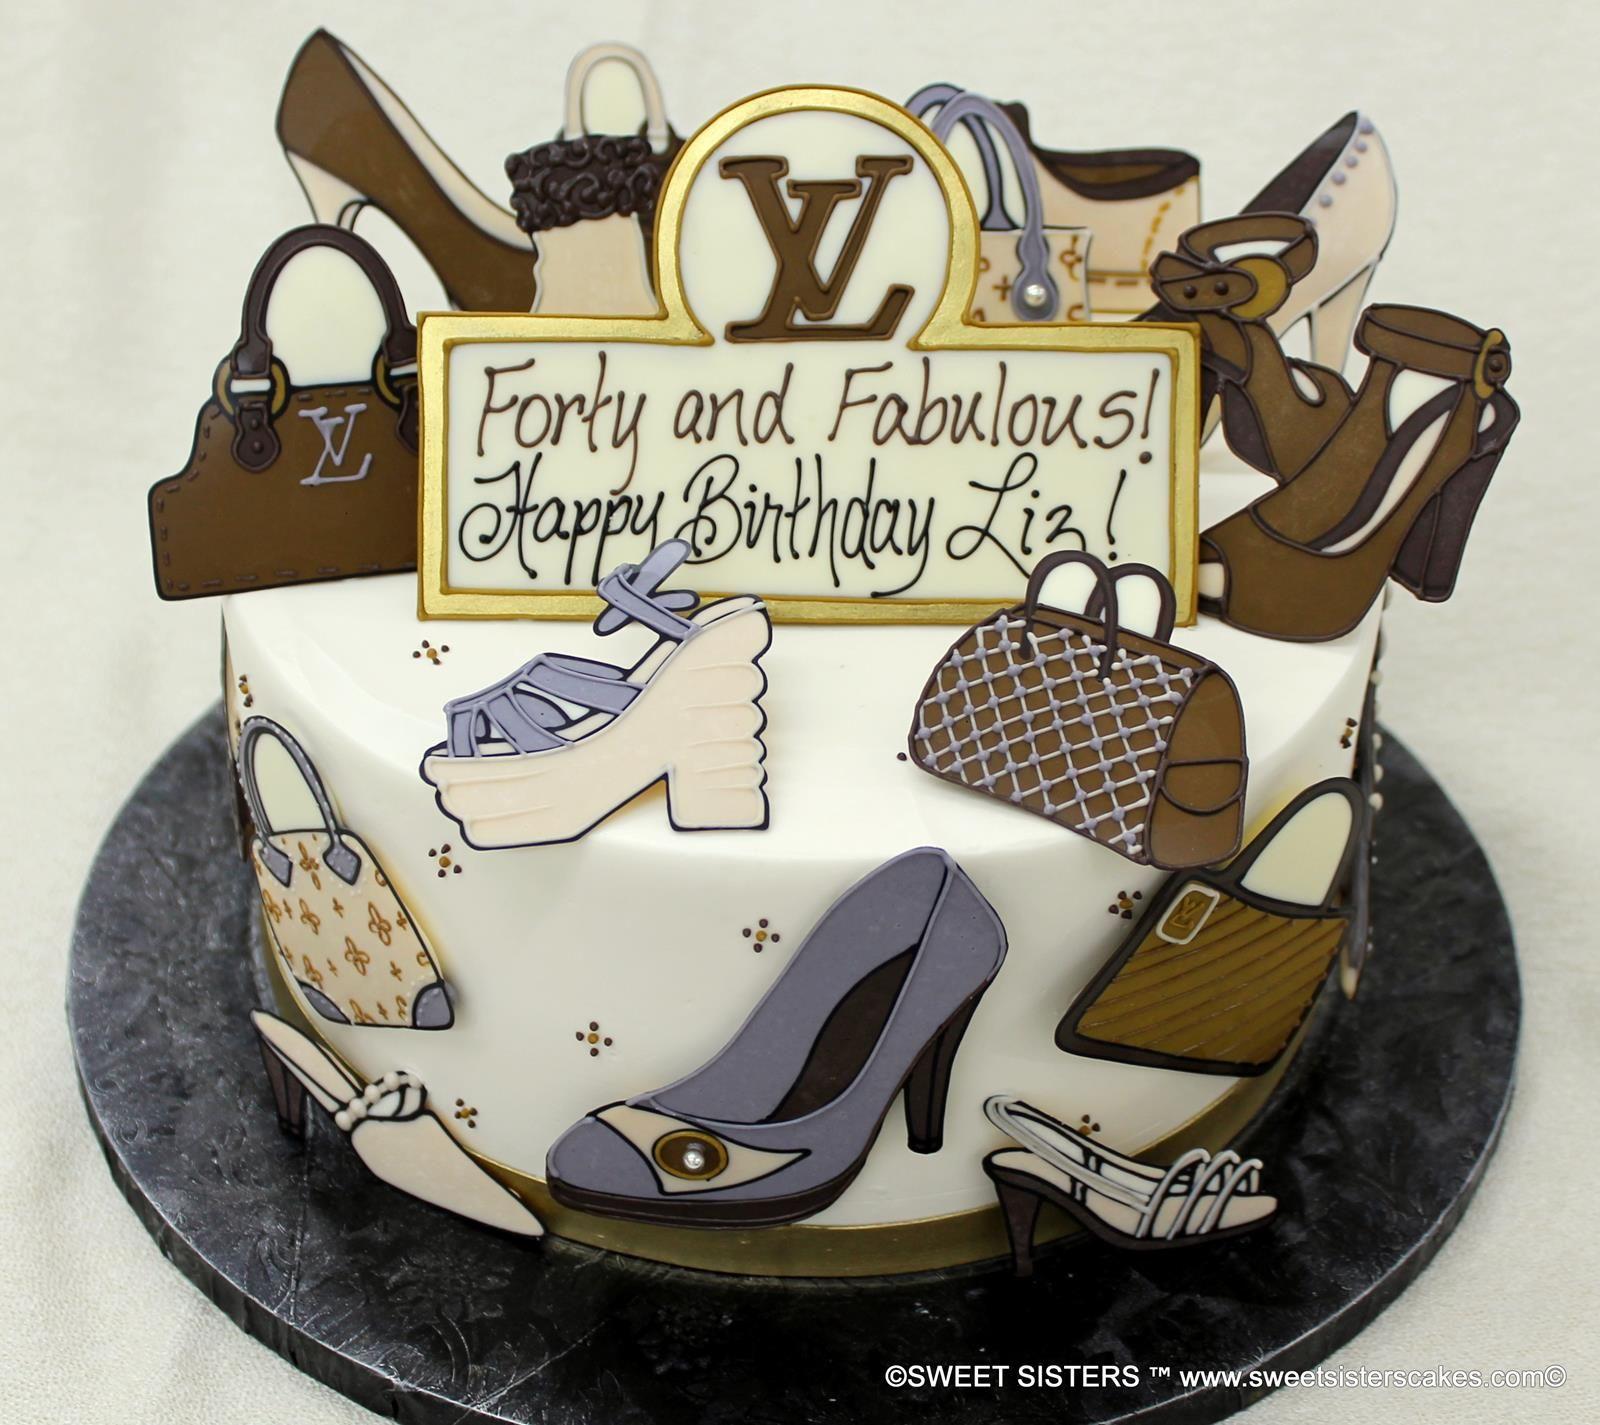 Happy Birthday To The Fashionista Of Group Desserts Cakes Happybirthday LV LouisVuitton Fashion Shoes Handbag